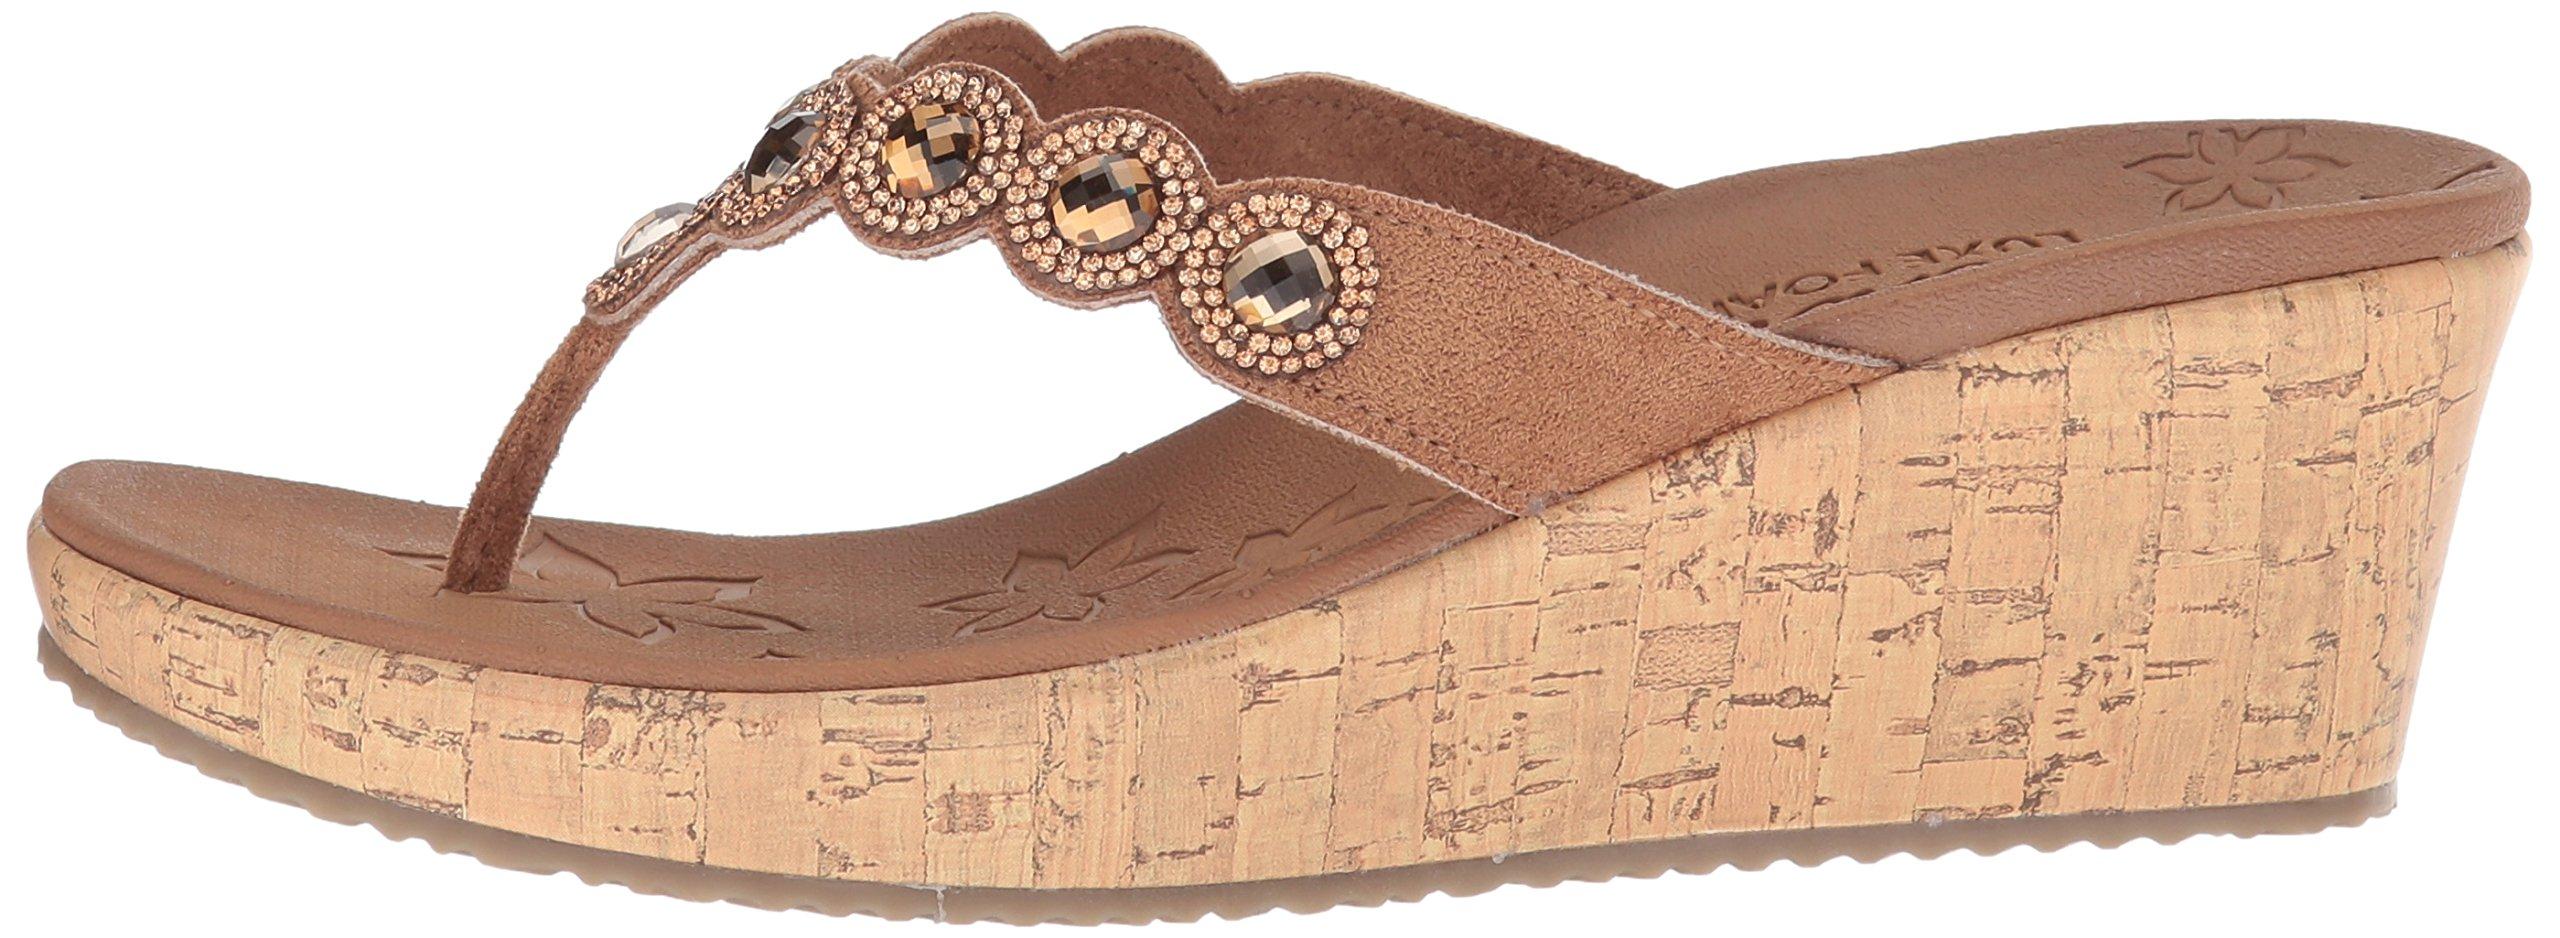 8777f770601 Skechers Cali Women s Beverlee-Bizzy Babe Wedge Sandal